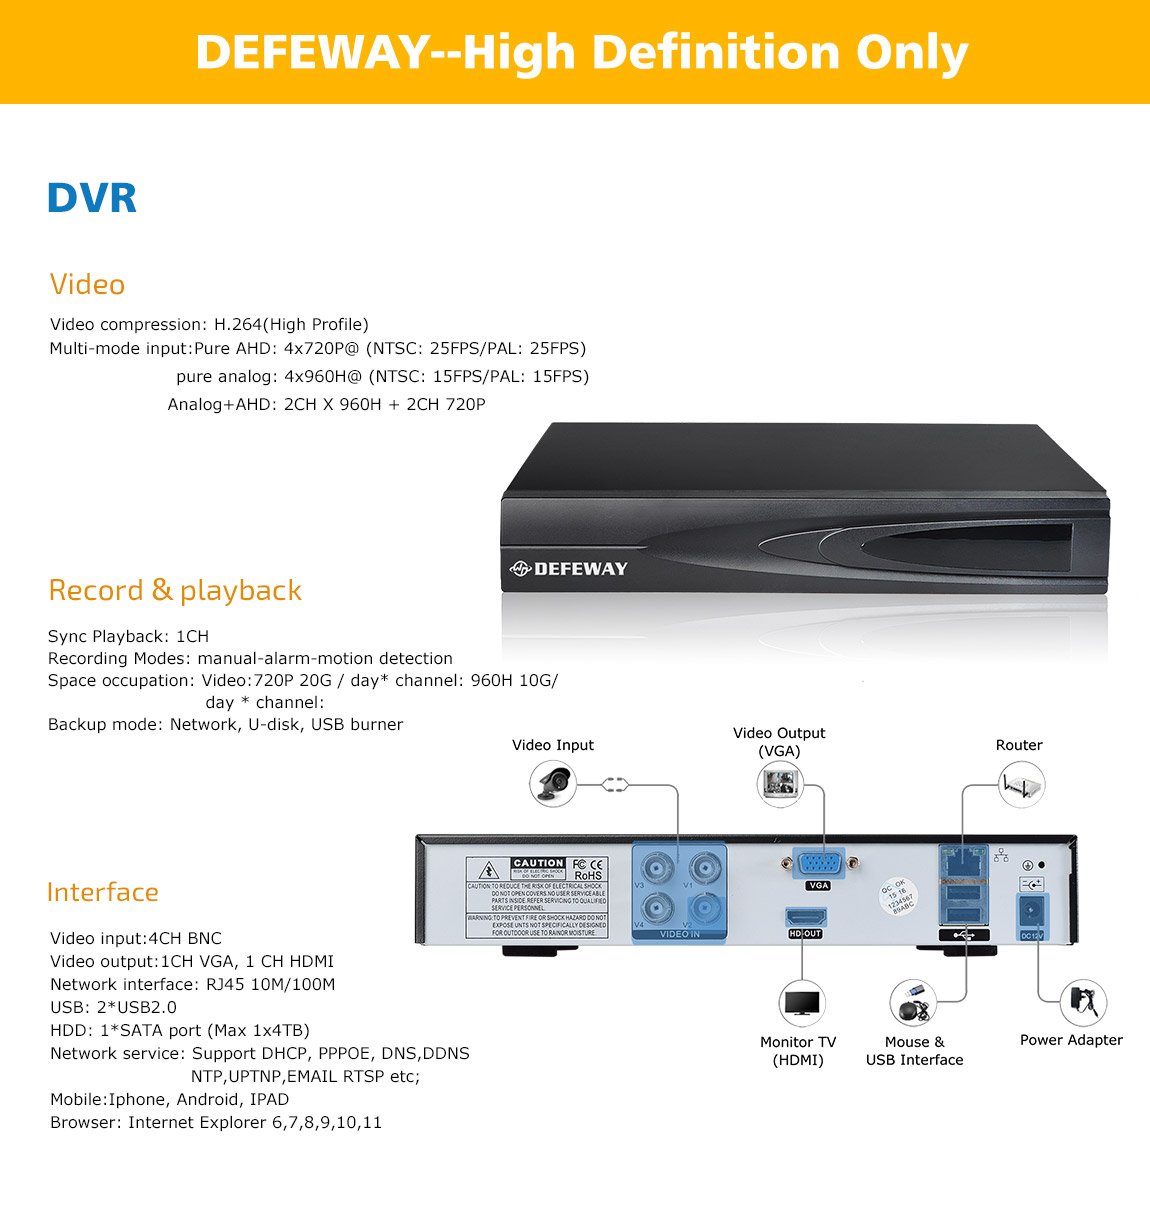 HD 1080P 8ch מצלמות במעגל סגור, מערכת NVR עבור מצלמת IP 8 ערוצים מלאה 960H מקליט וידאו עם 800TVL מערכת מעקב וידאו